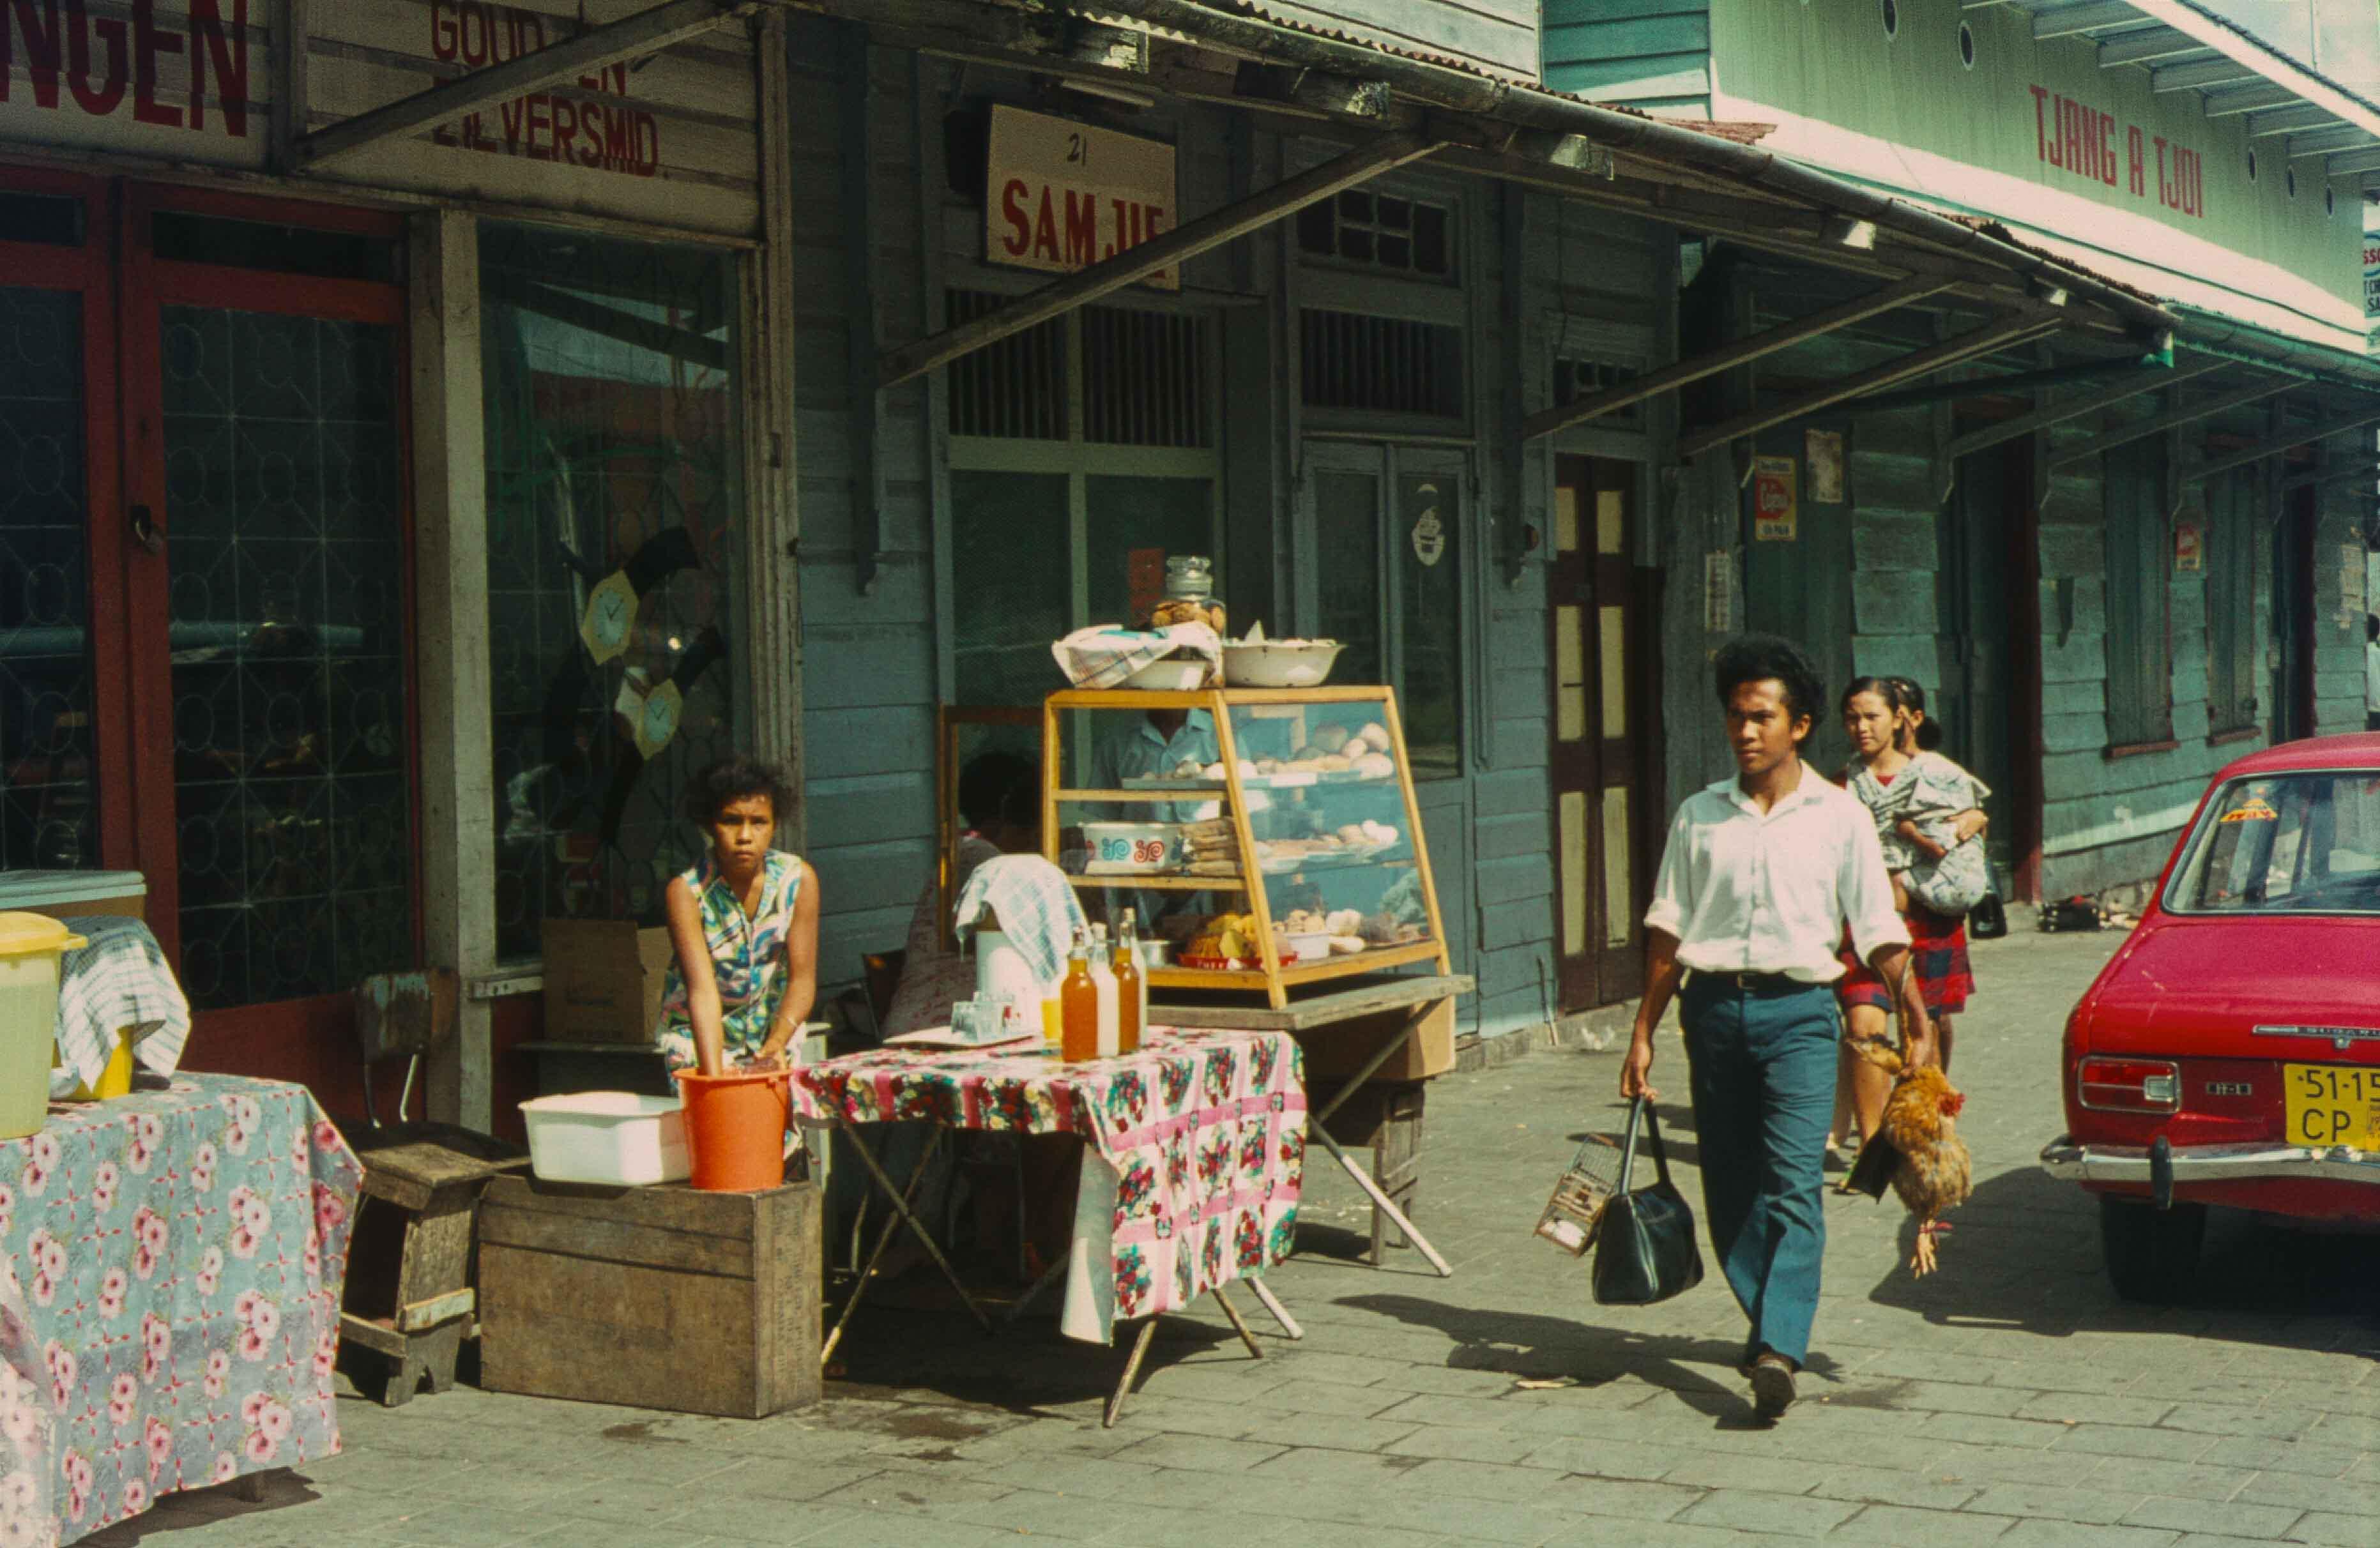 343. Suriname